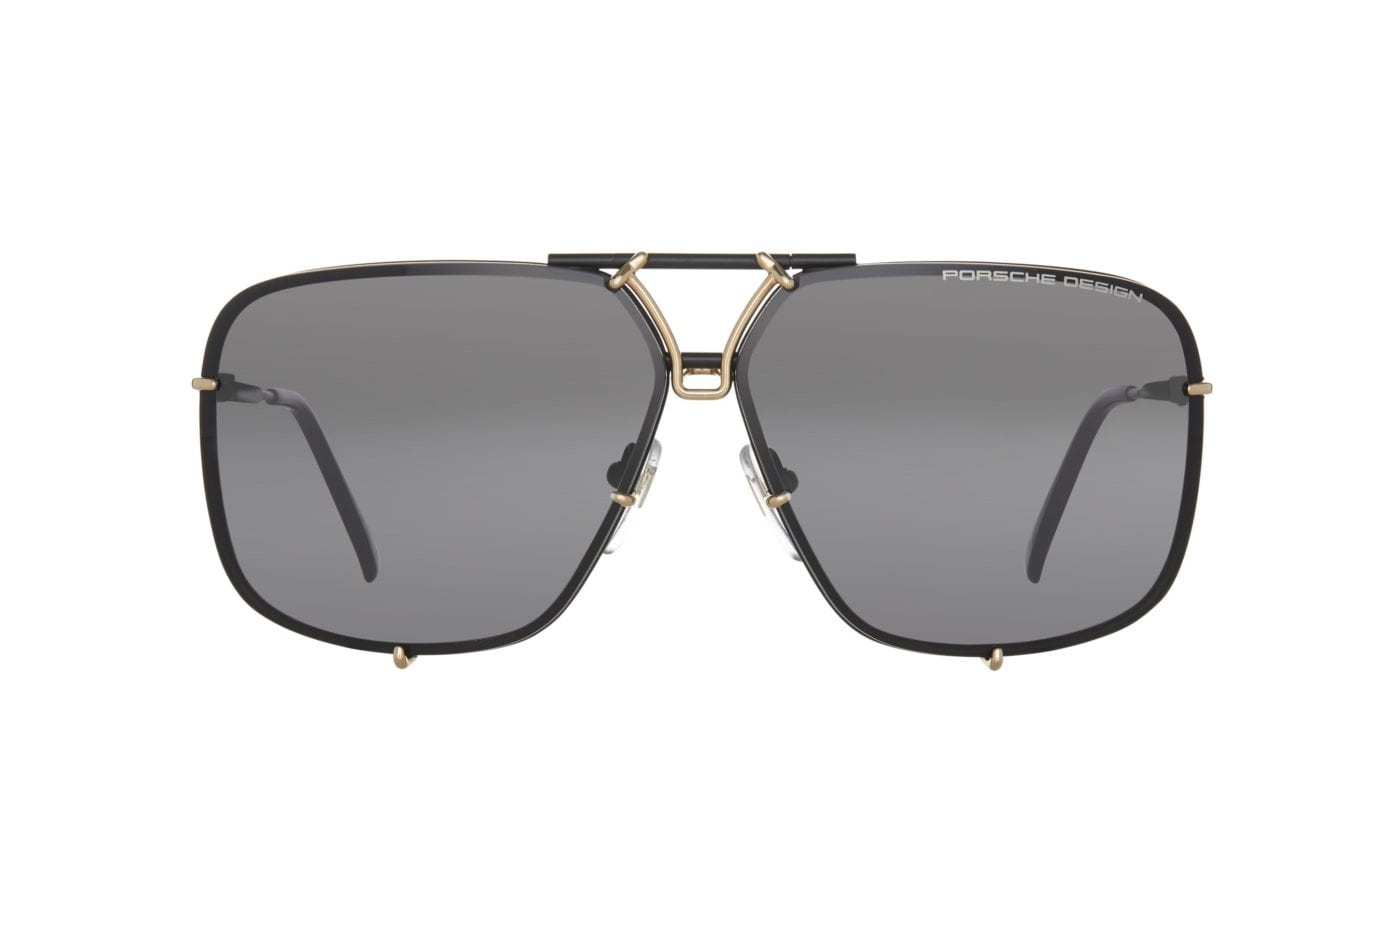 Porsche Design Eyewear P8928d front